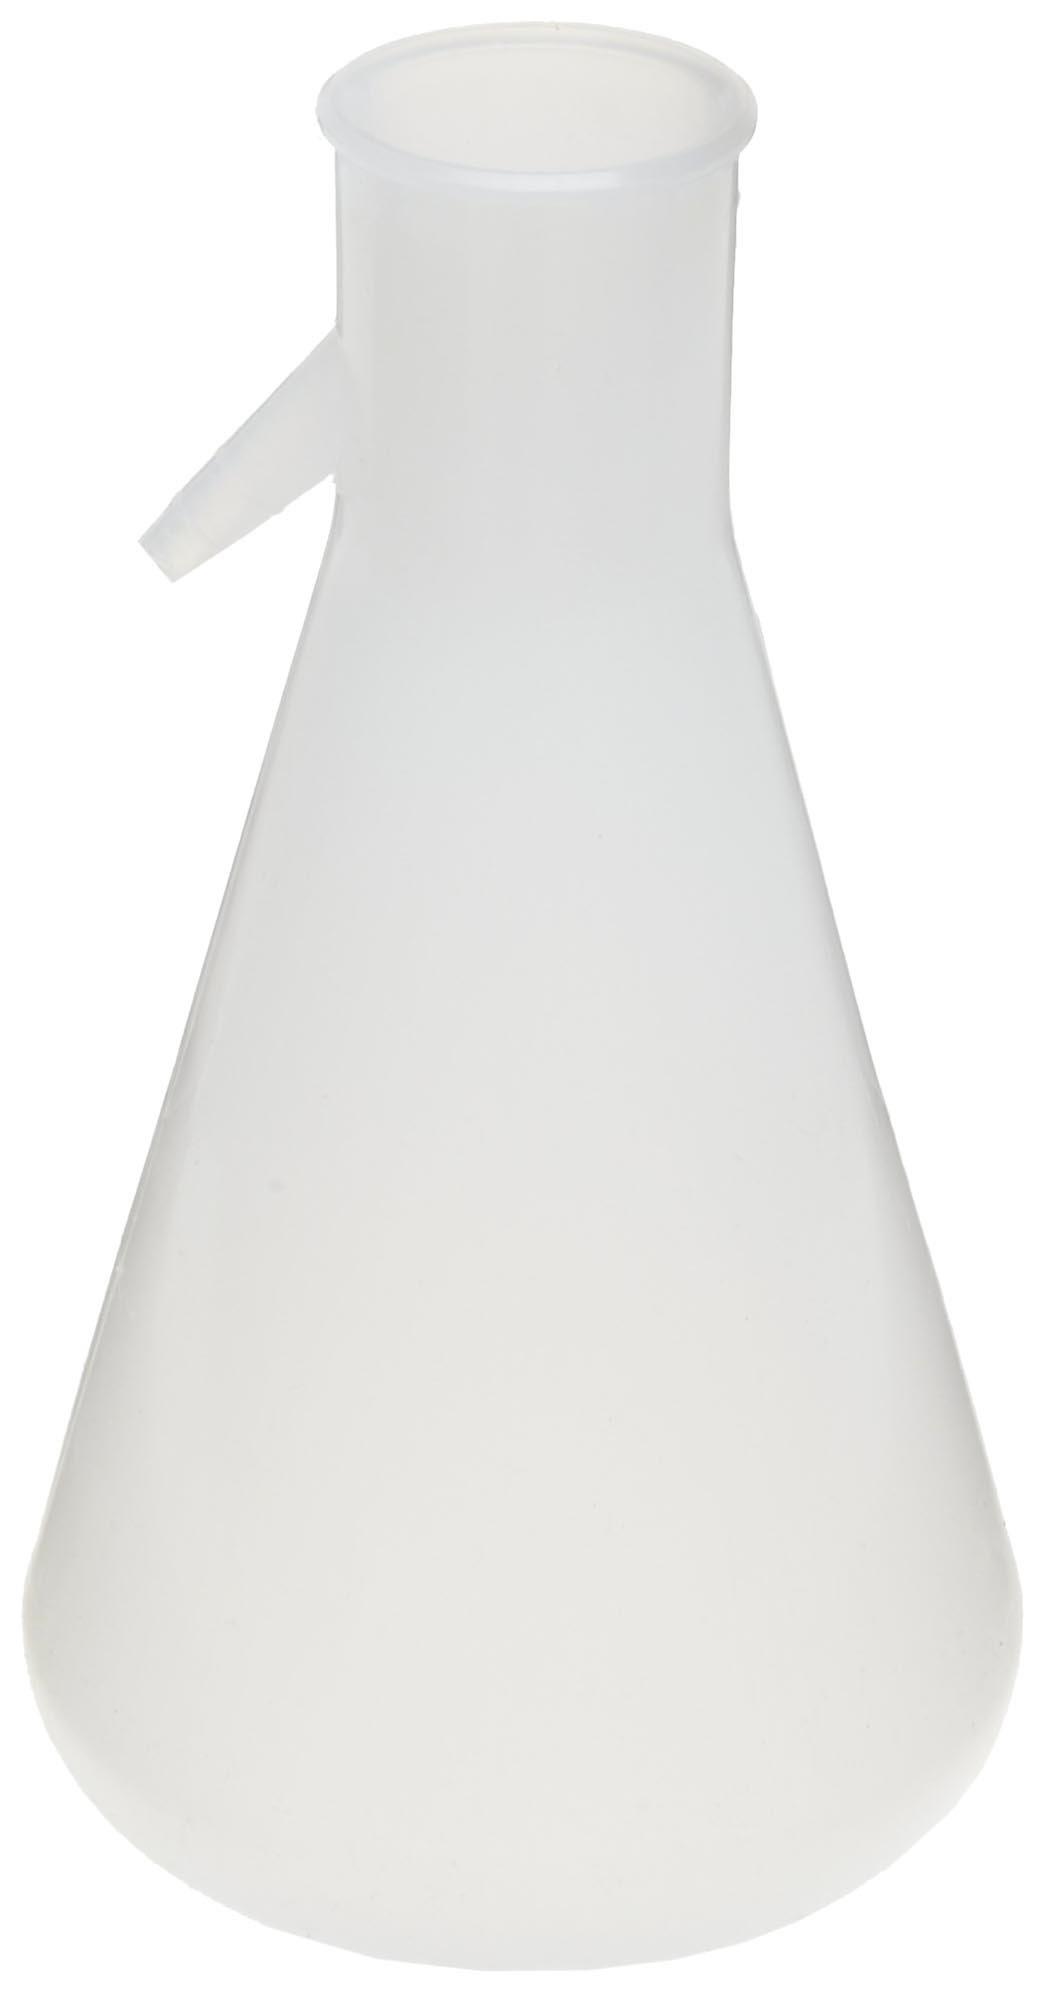 Nalgene DS4101-1000 Polypropylene 1000mL Filtering Flask with Angled Tubulation